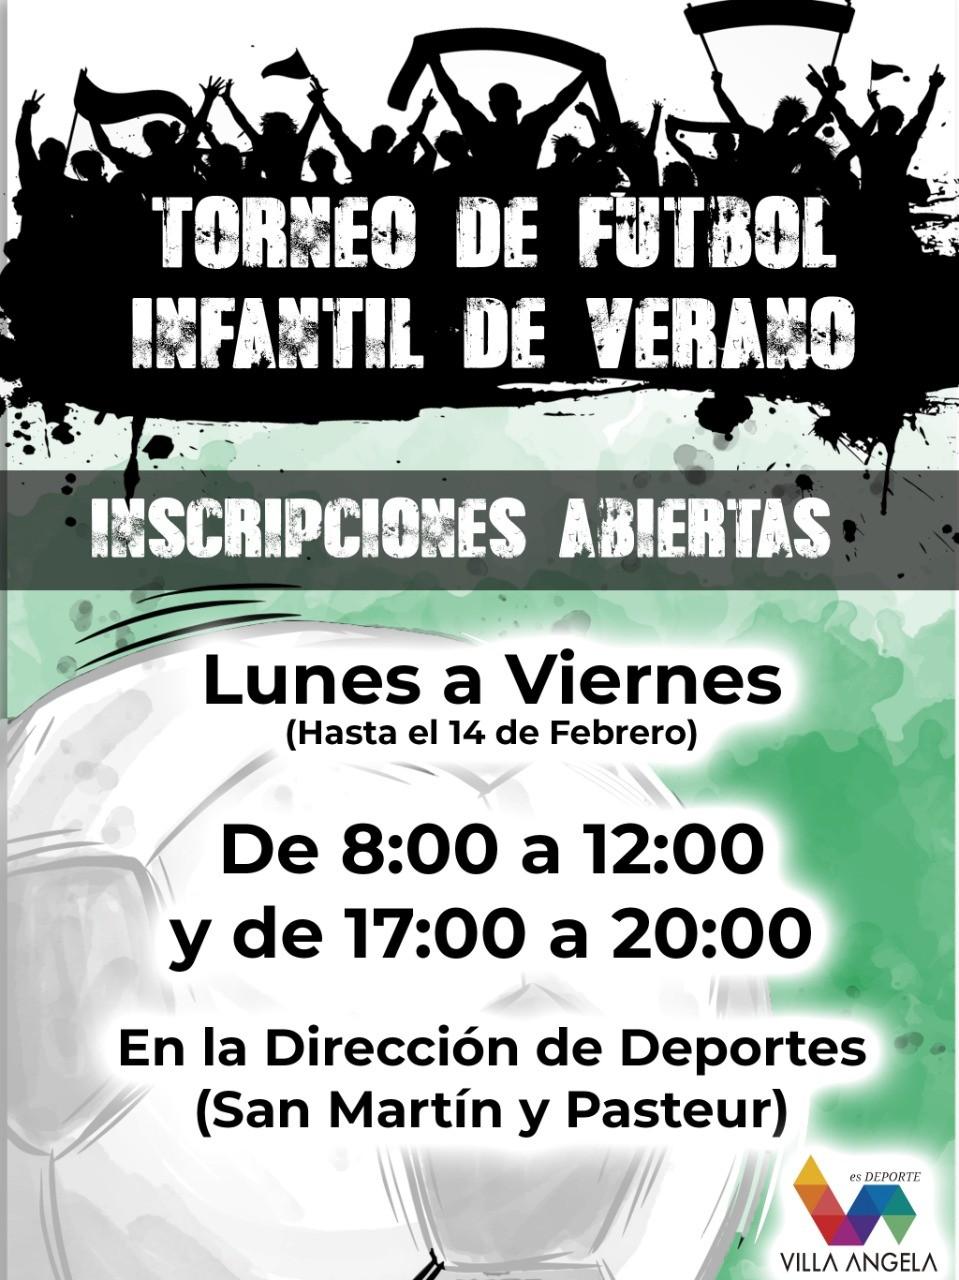 EL MUNICIPIO INVITA AL TORNEO INFANTIL DE FUTBOL DE VERANO